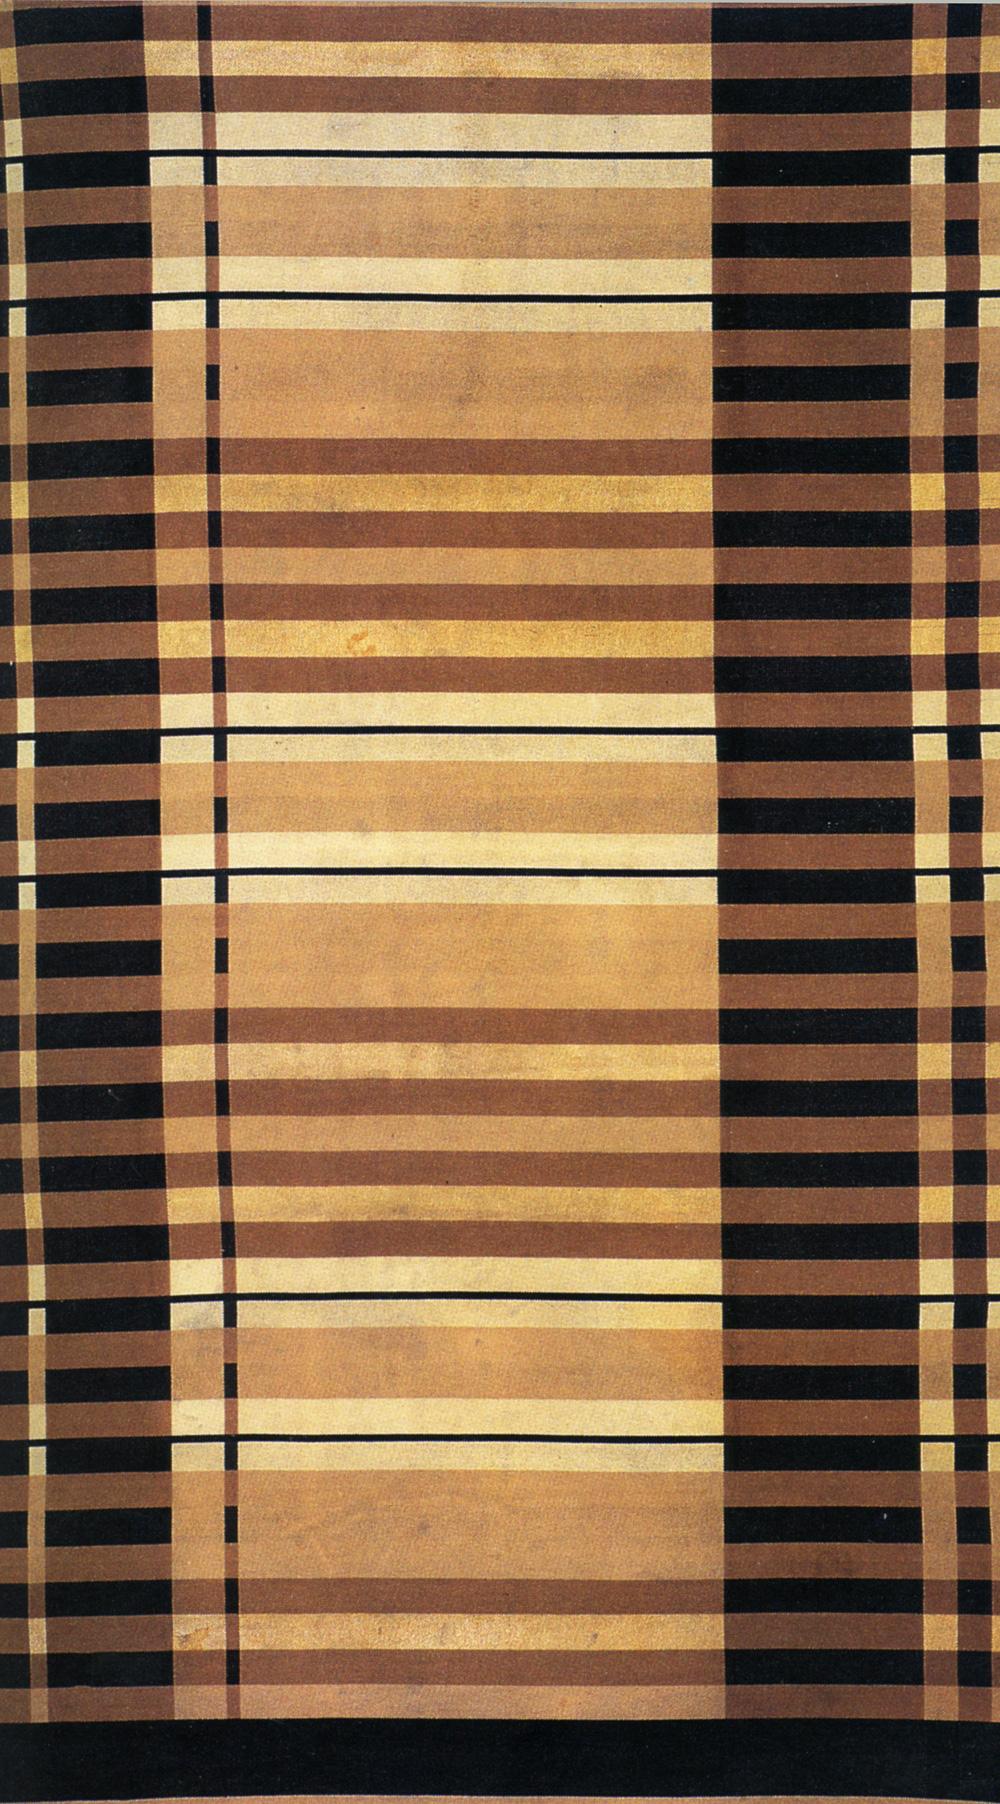 textile designers of the bauhaus julia ritson. Black Bedroom Furniture Sets. Home Design Ideas